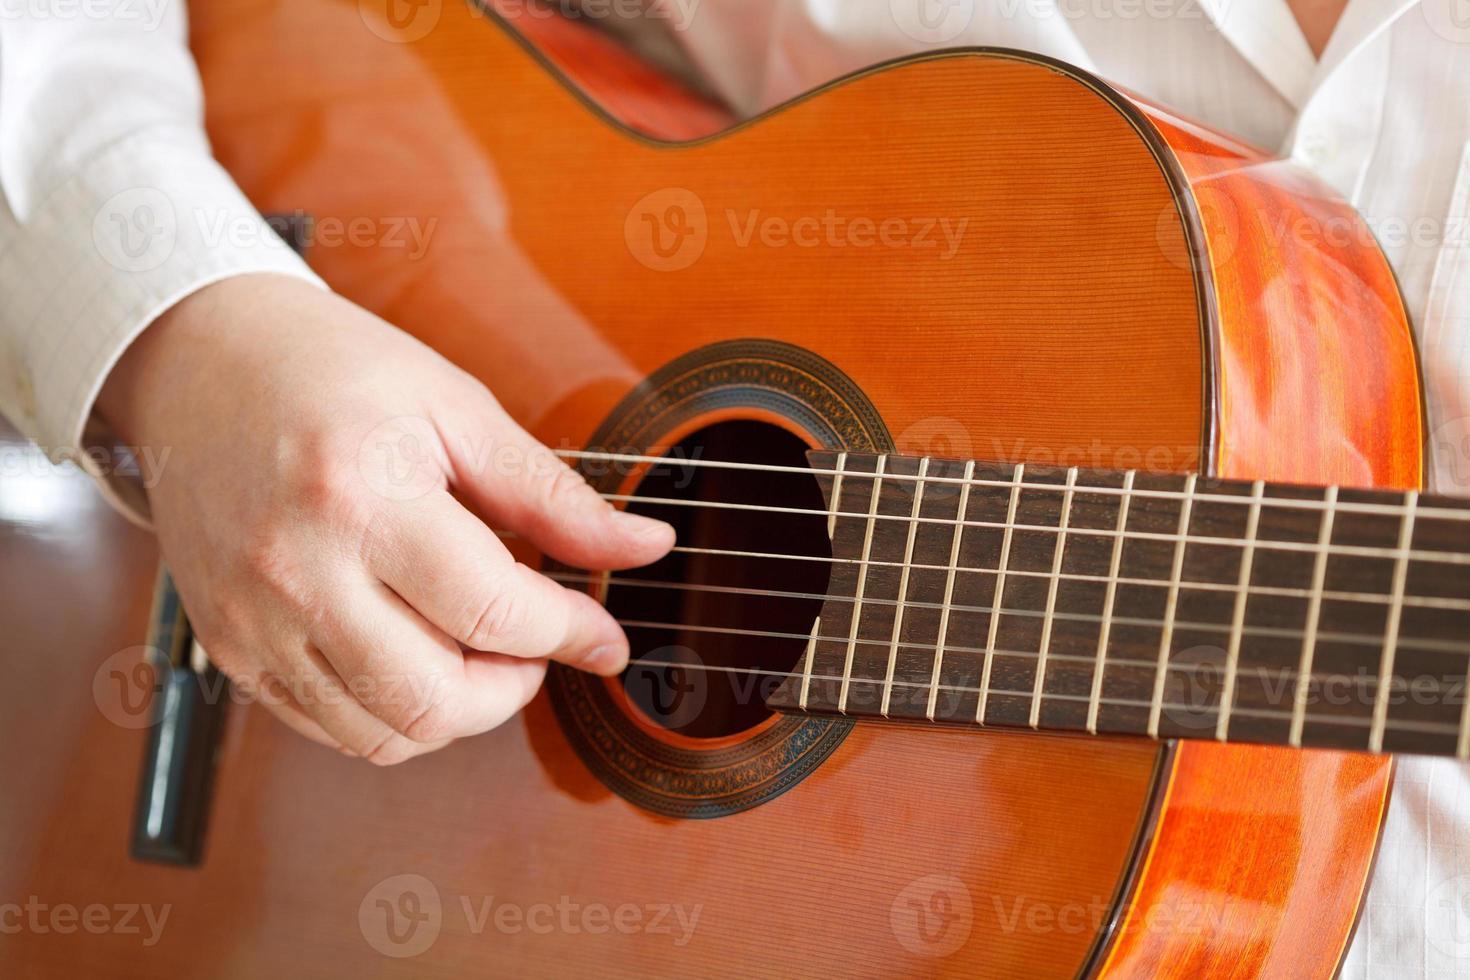 Mann spielt klassische Akustikgitarre foto